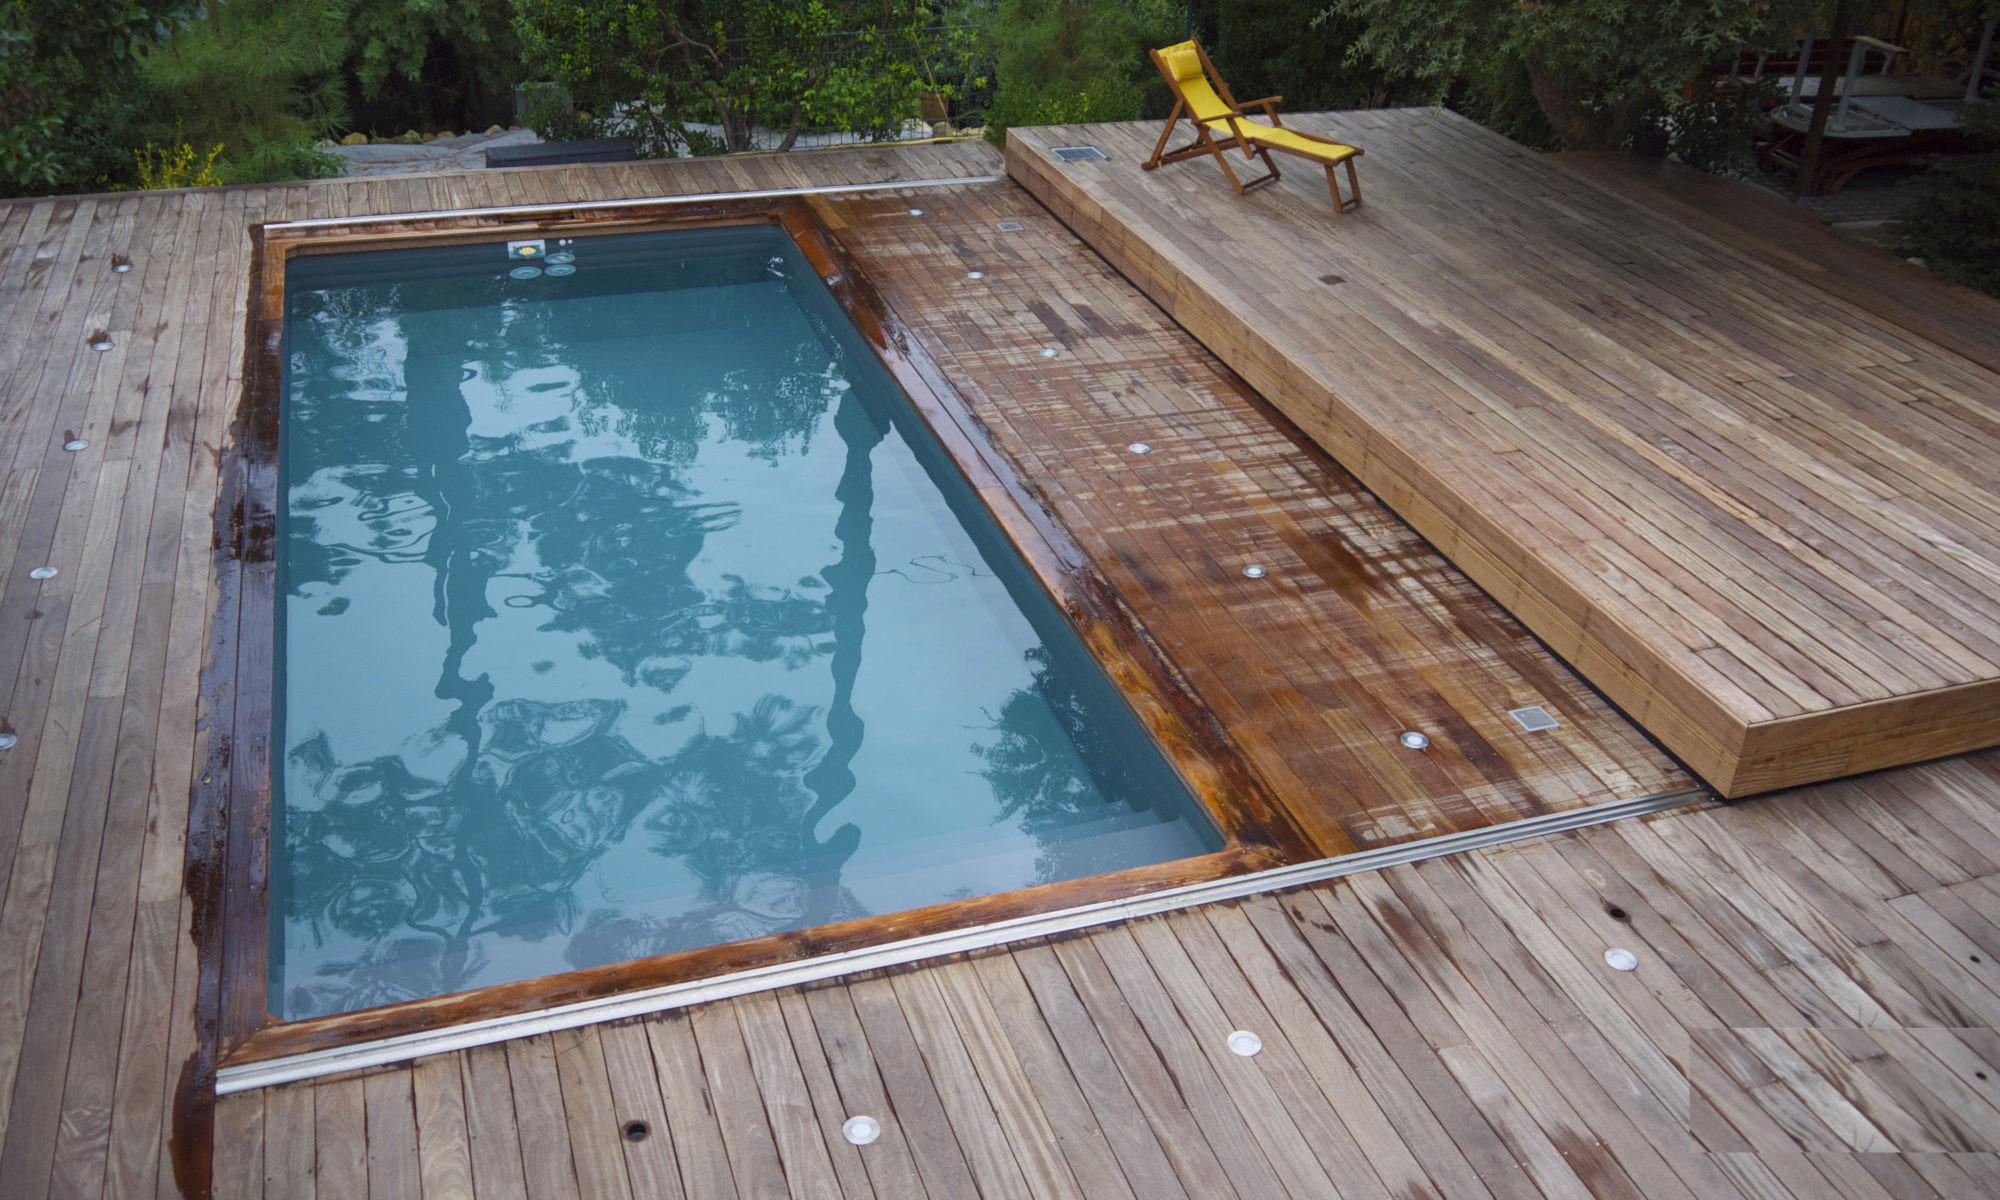 Couverture Piscine Avec Terrasse | Fabricant Volet Roulant ... tout Terrasse Ipe Piscine